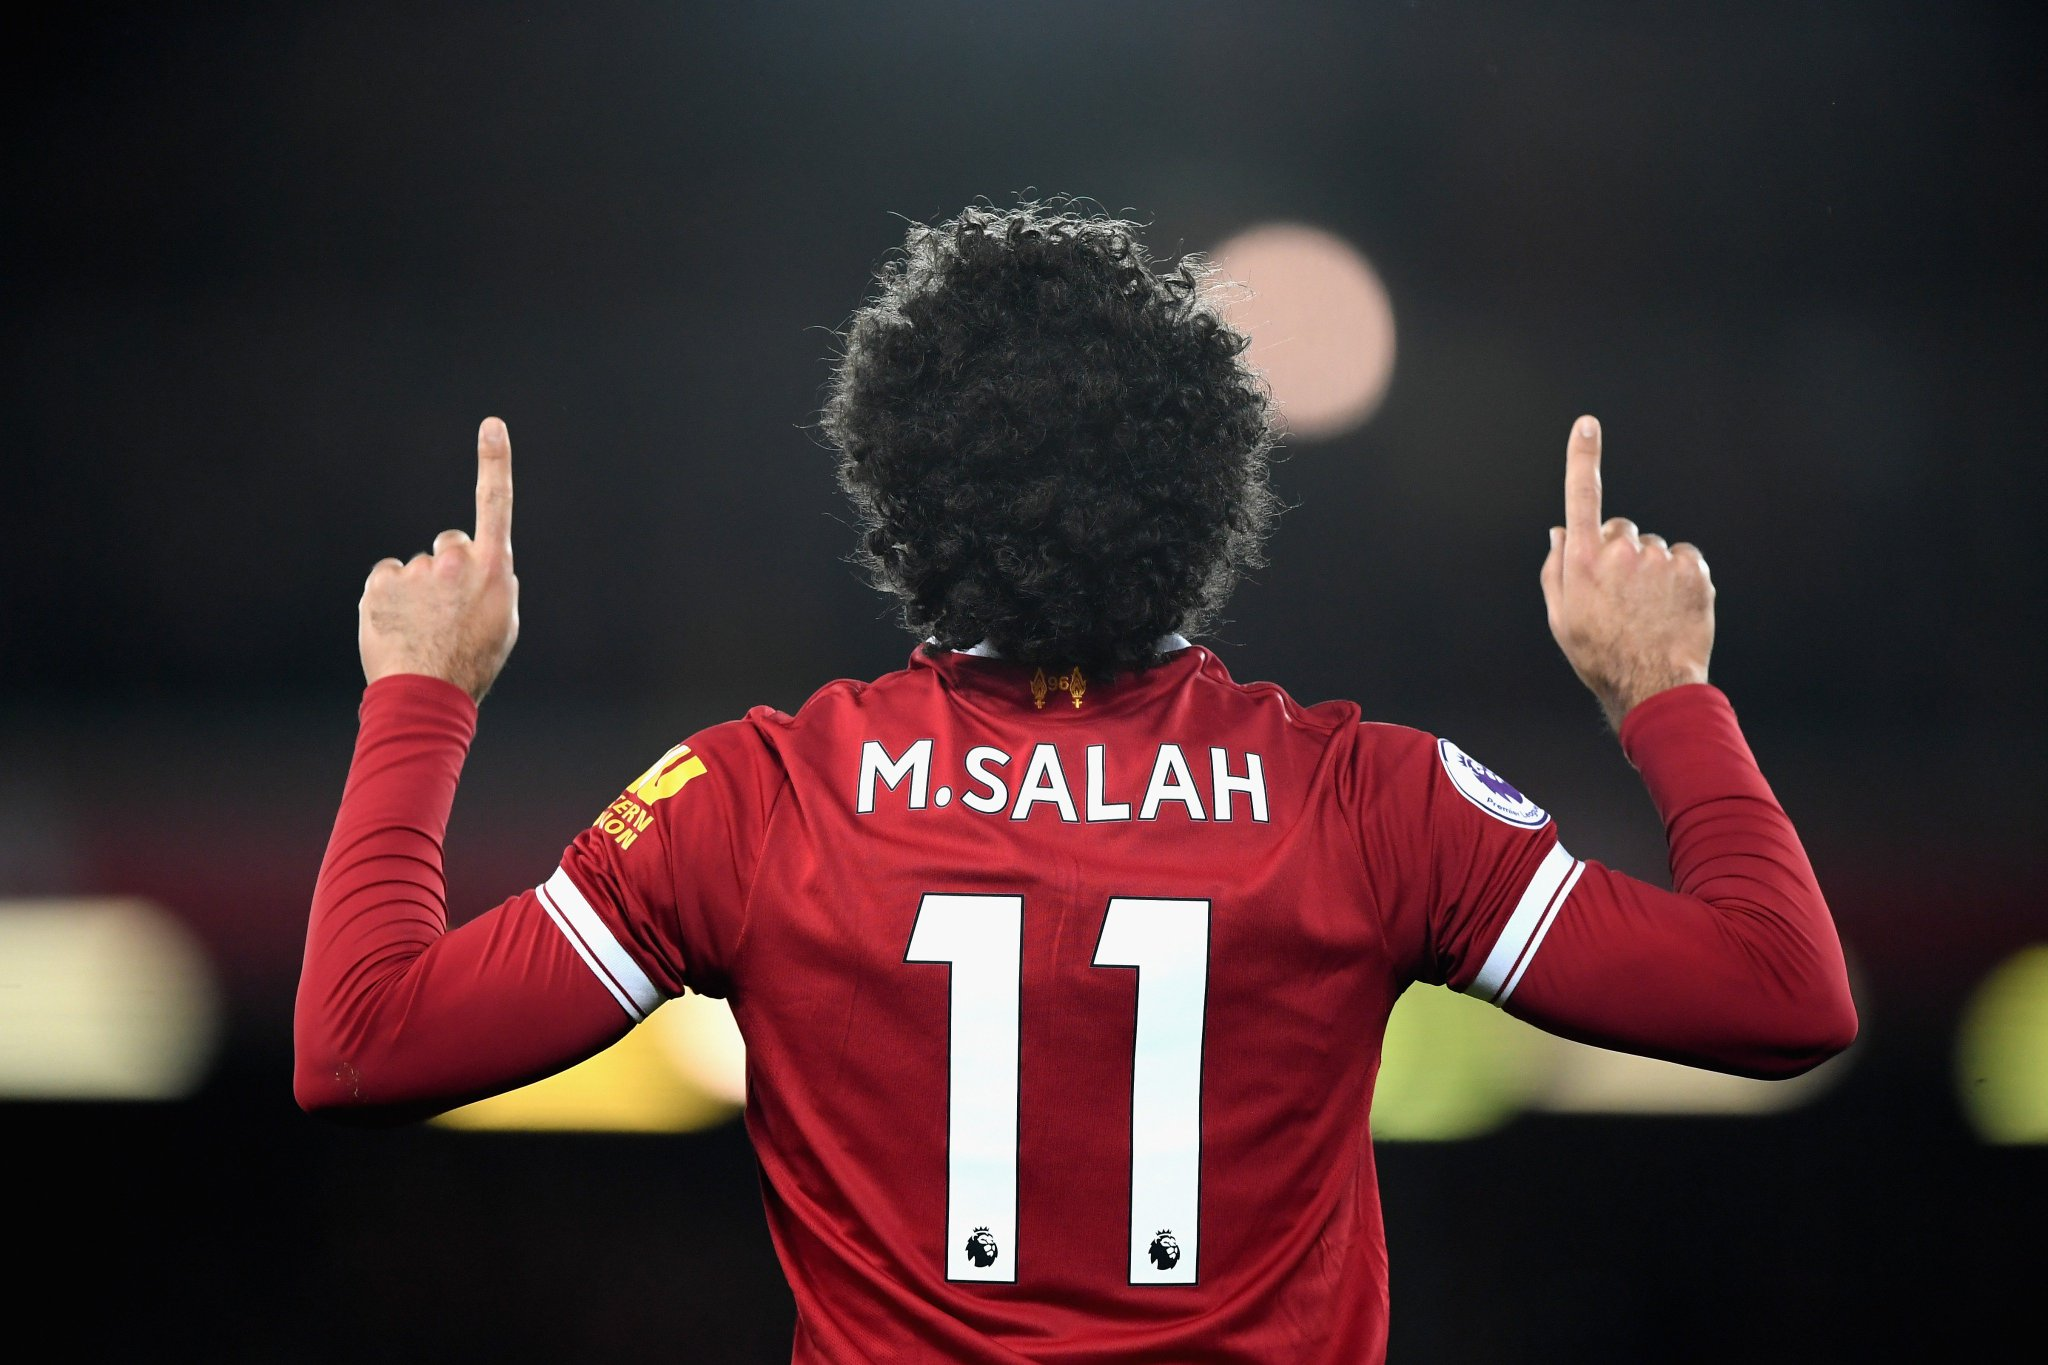 ���� Happy birthday, Liverpool's Egyptian phenomenon Mohamed Salah! ������  #UCL https://t.co/jKUvRnaUYp